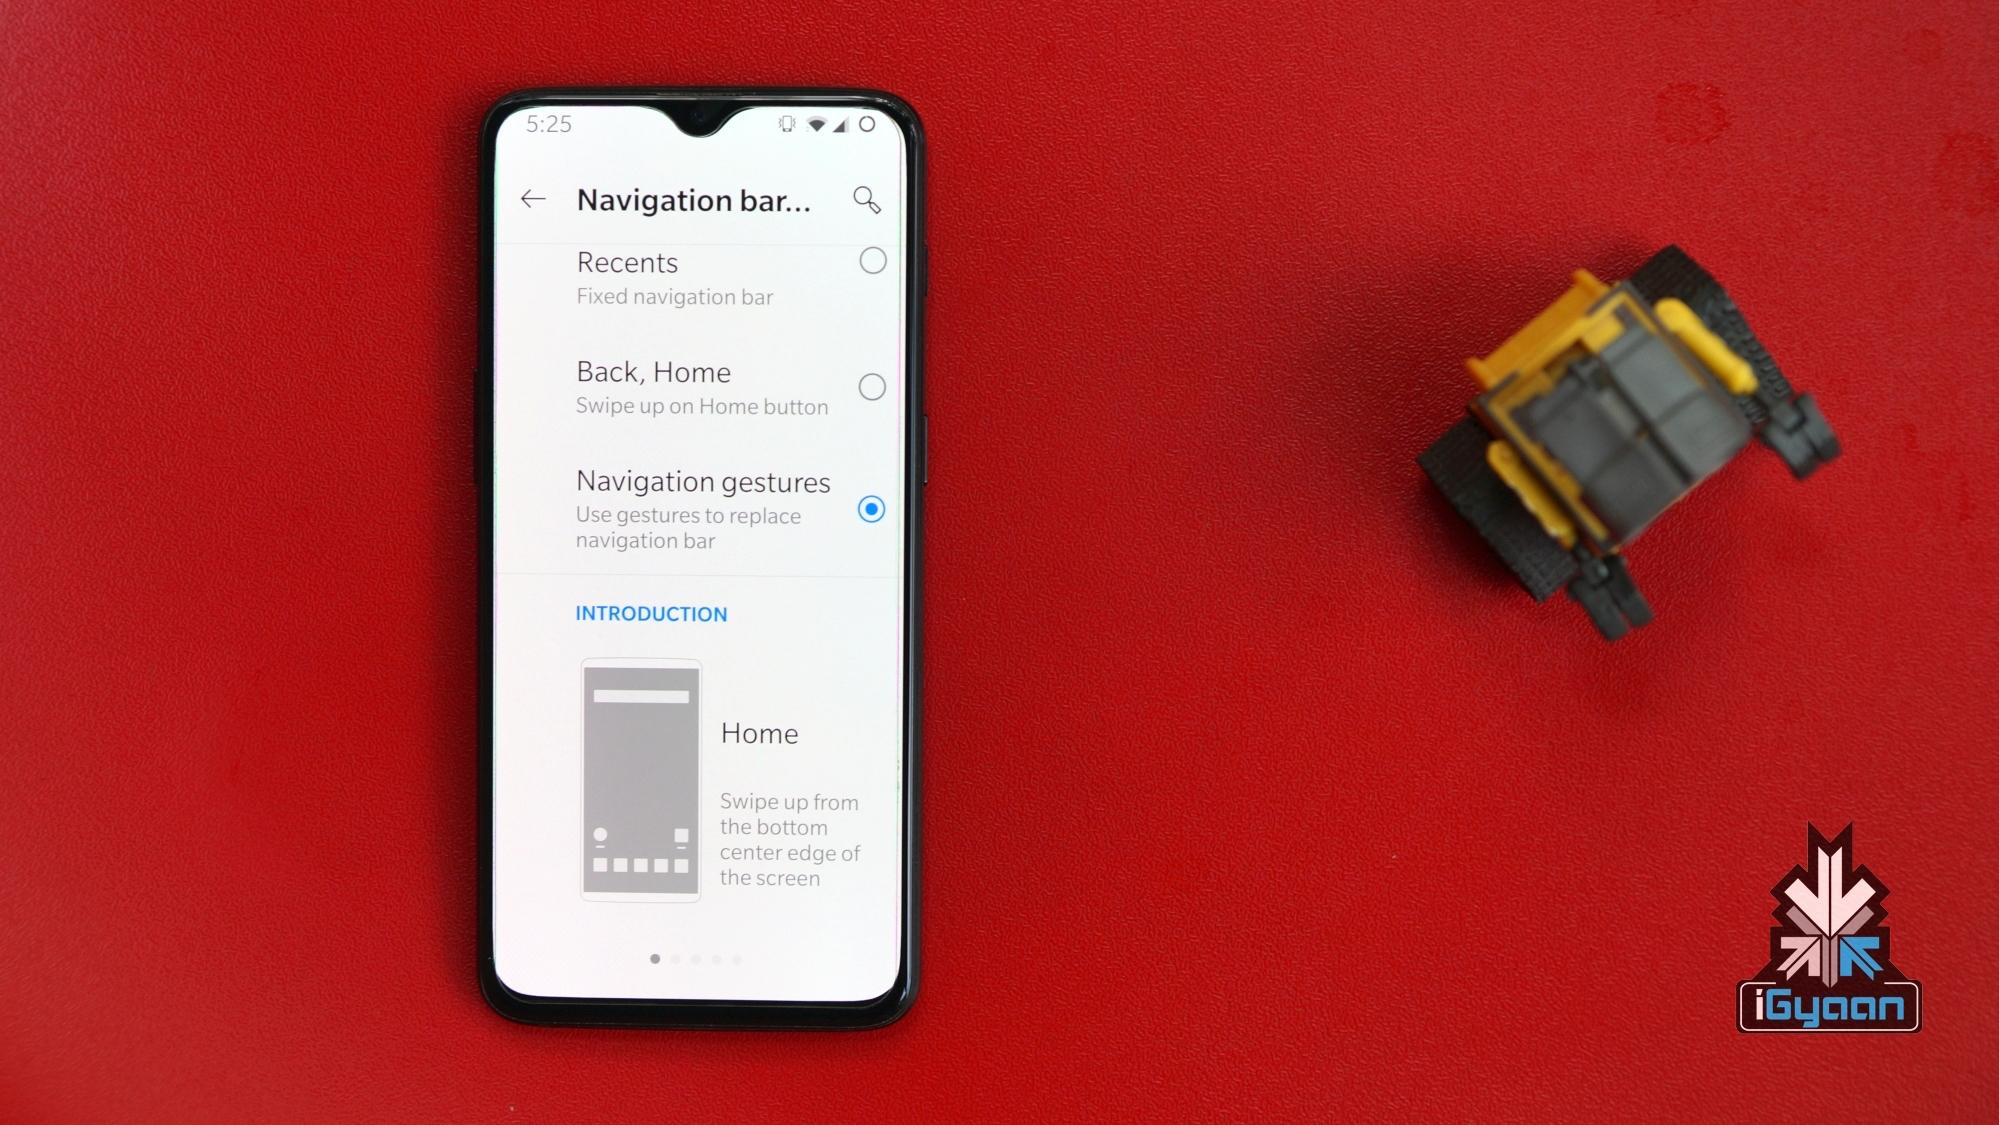 OnePlus Navigation Gestures